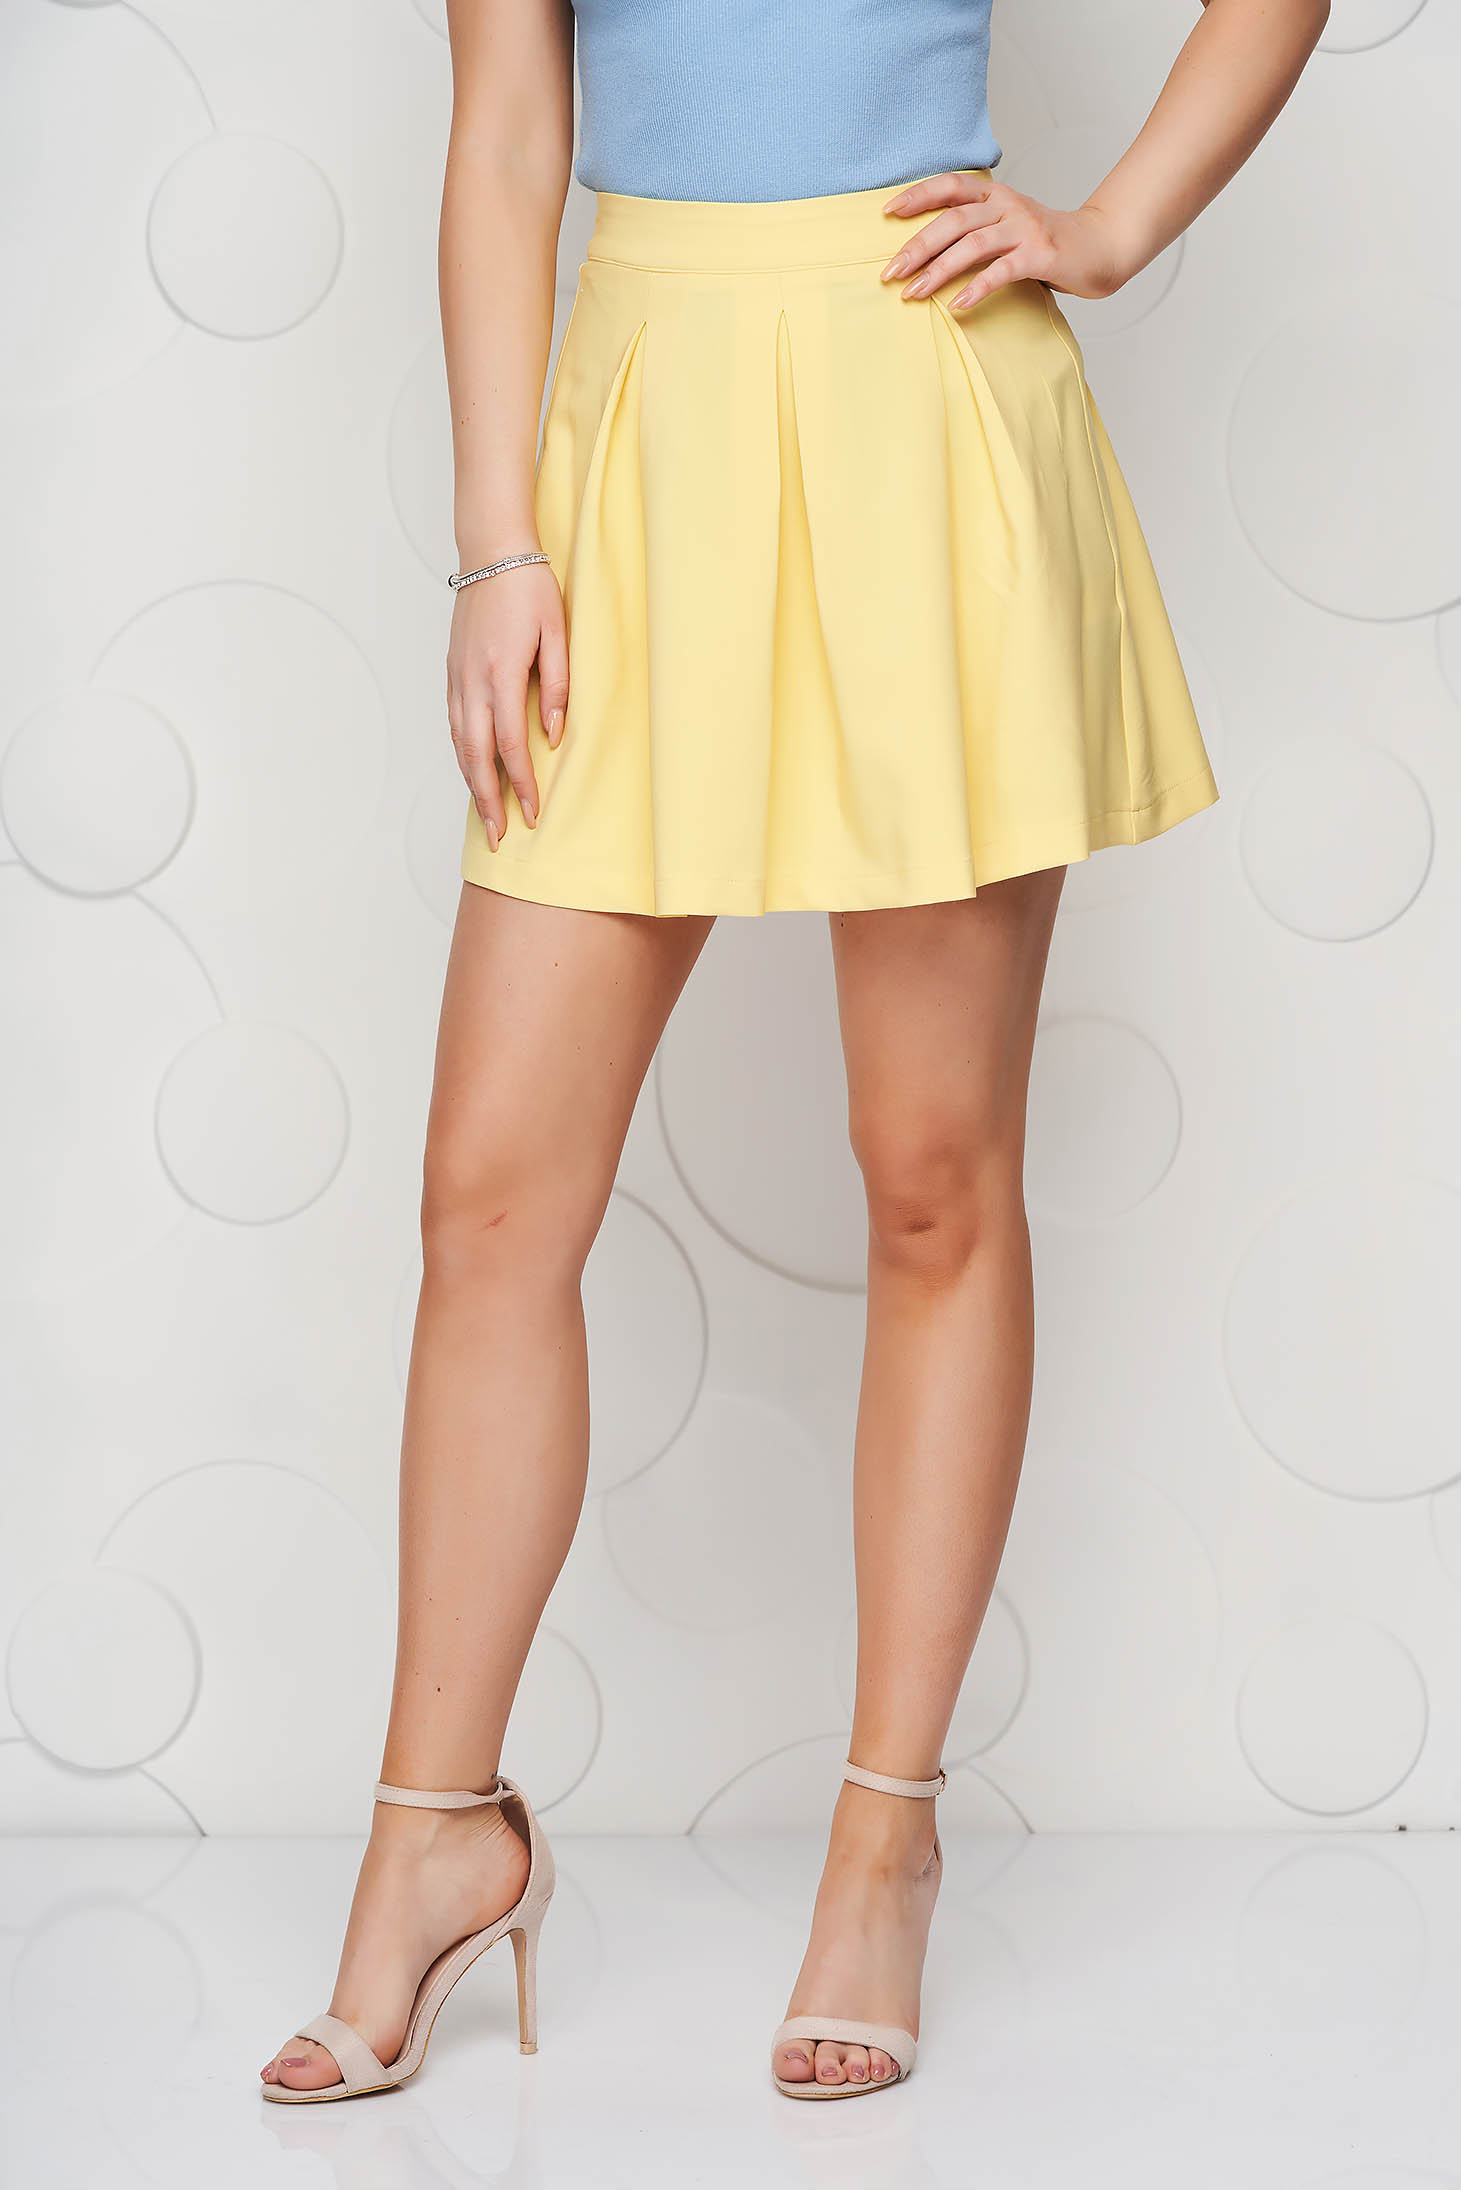 Yellow casual cloche skirt slightly elastic fabric medium waist